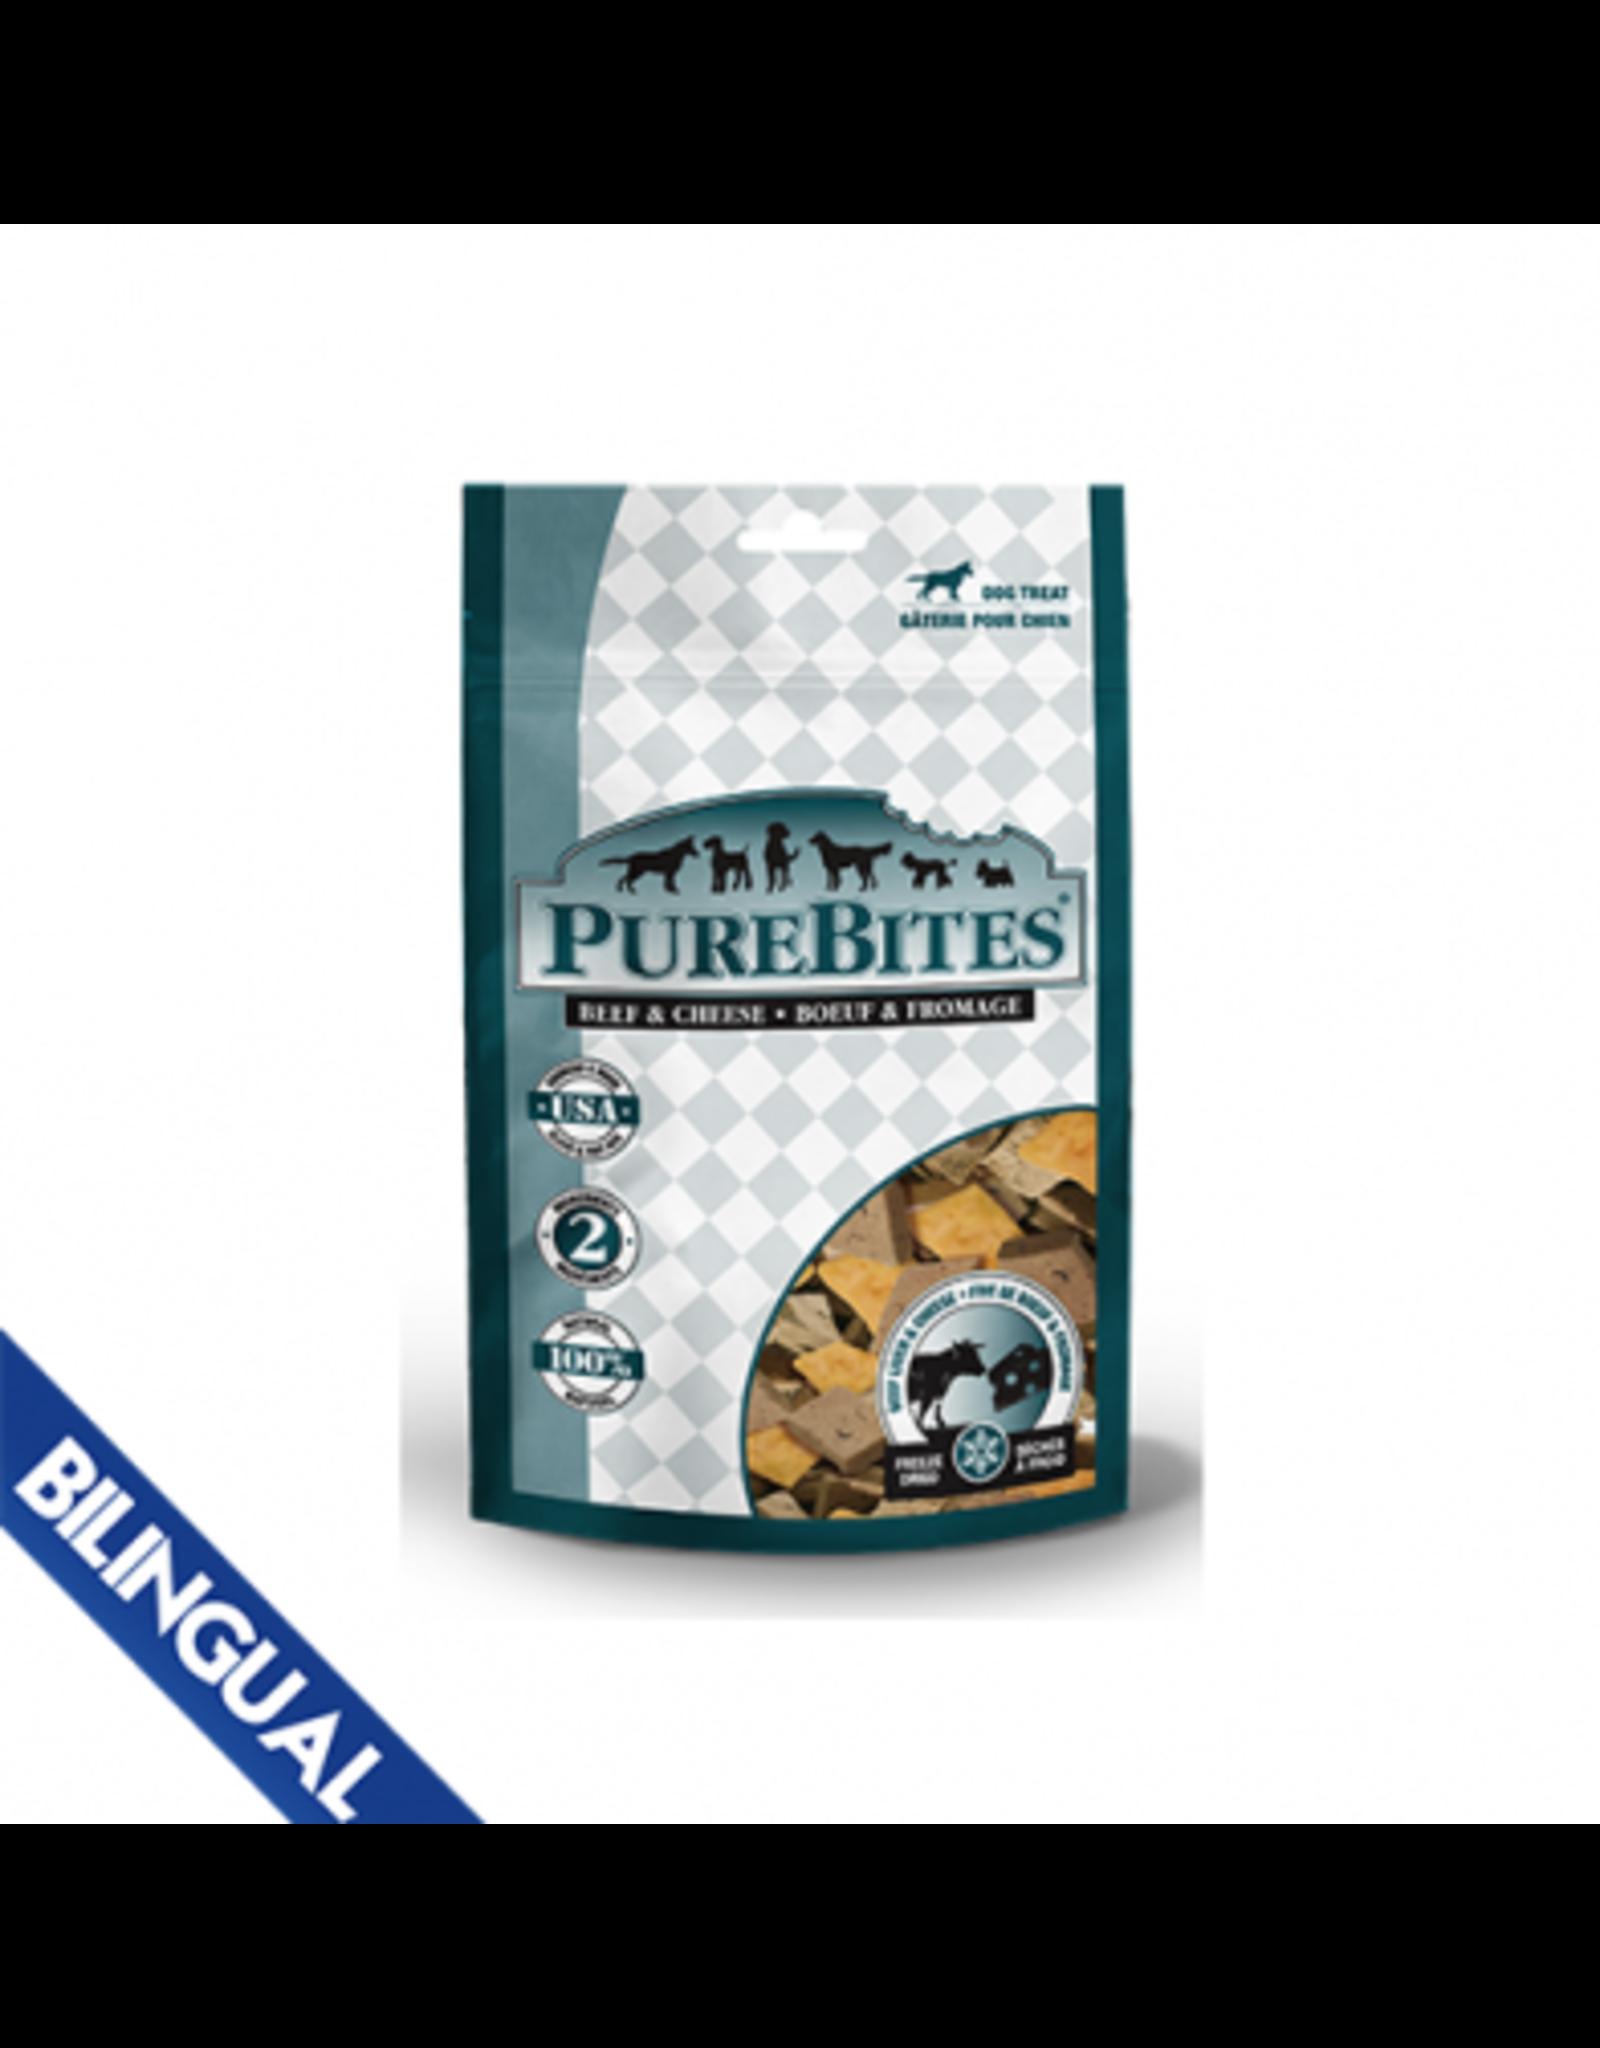 Purebites Purebites Dog Beef & Cheese Treats